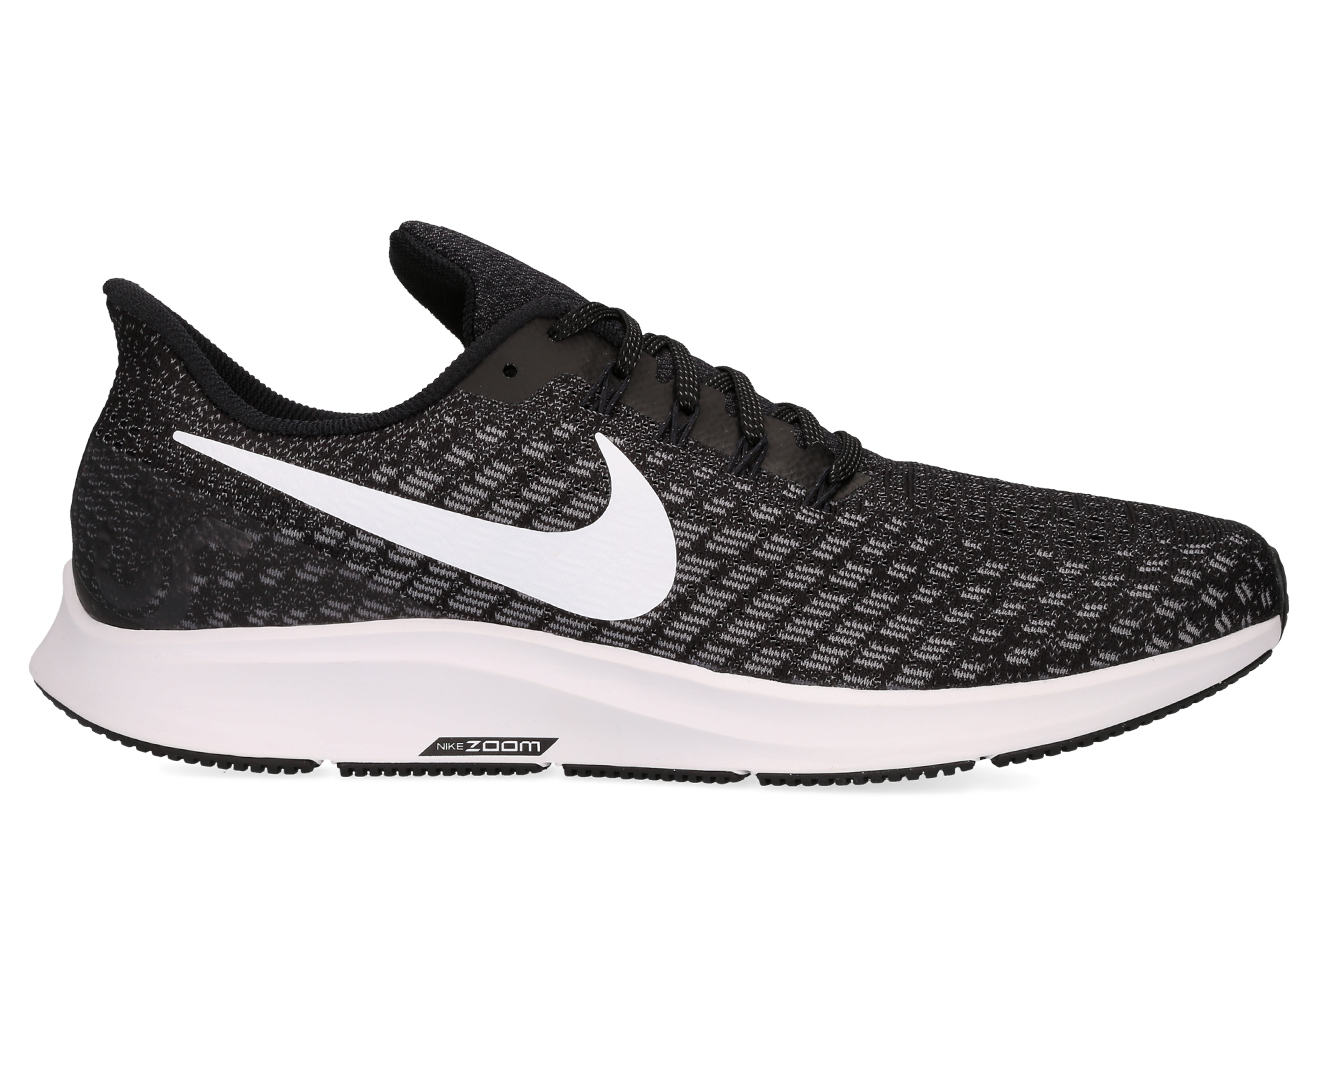 save off e5e80 112ac Nike Men s Air Zoom Pegasus 35 Shoe - Black Gunsmoke Oil Grey White    Catch.com.au